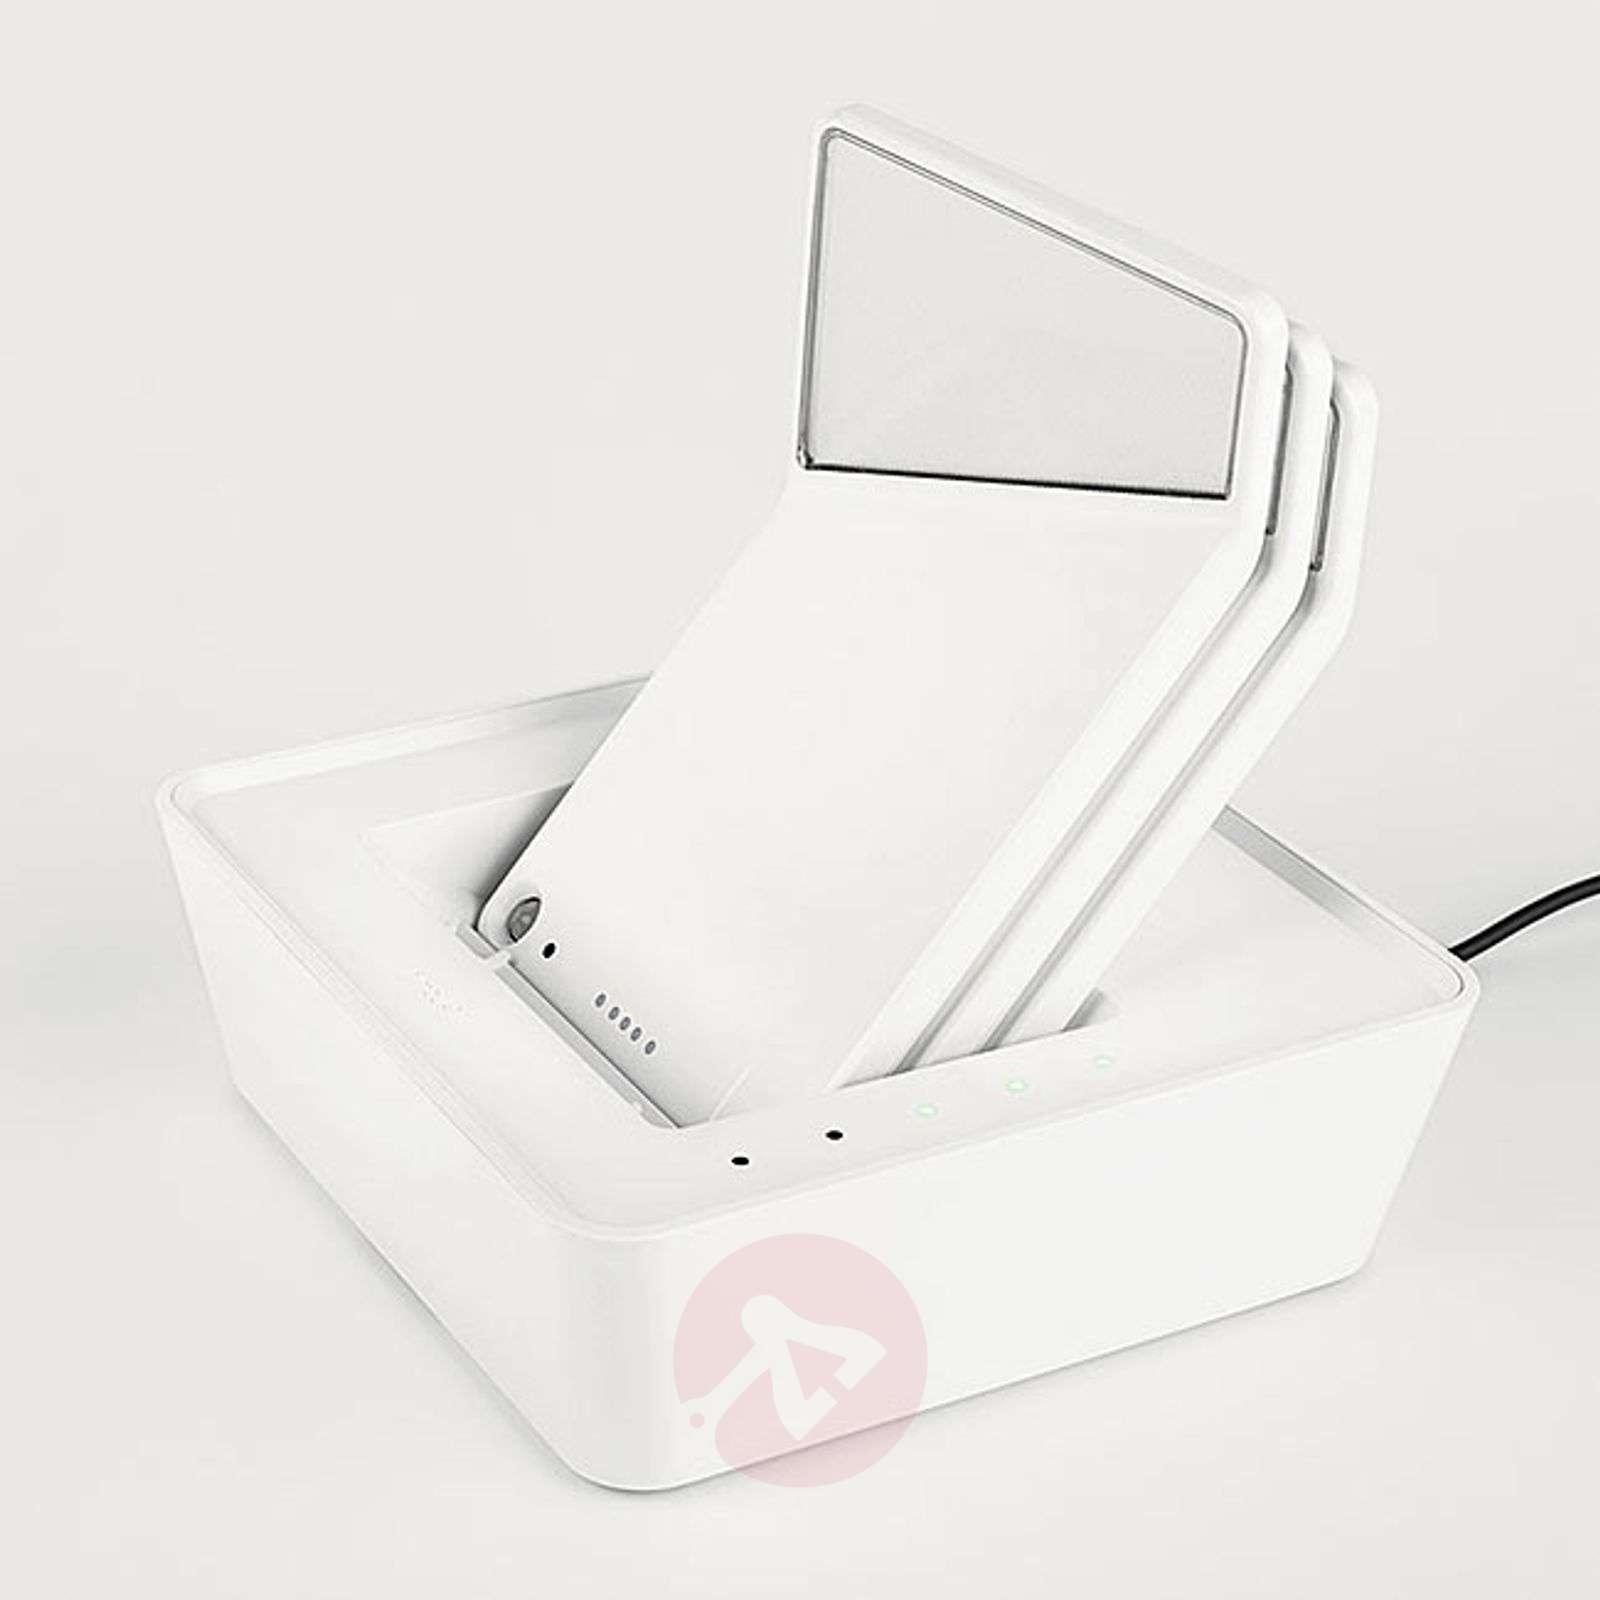 Nimbus Winglet CL-latausasema, Basket Charger-7018054-01